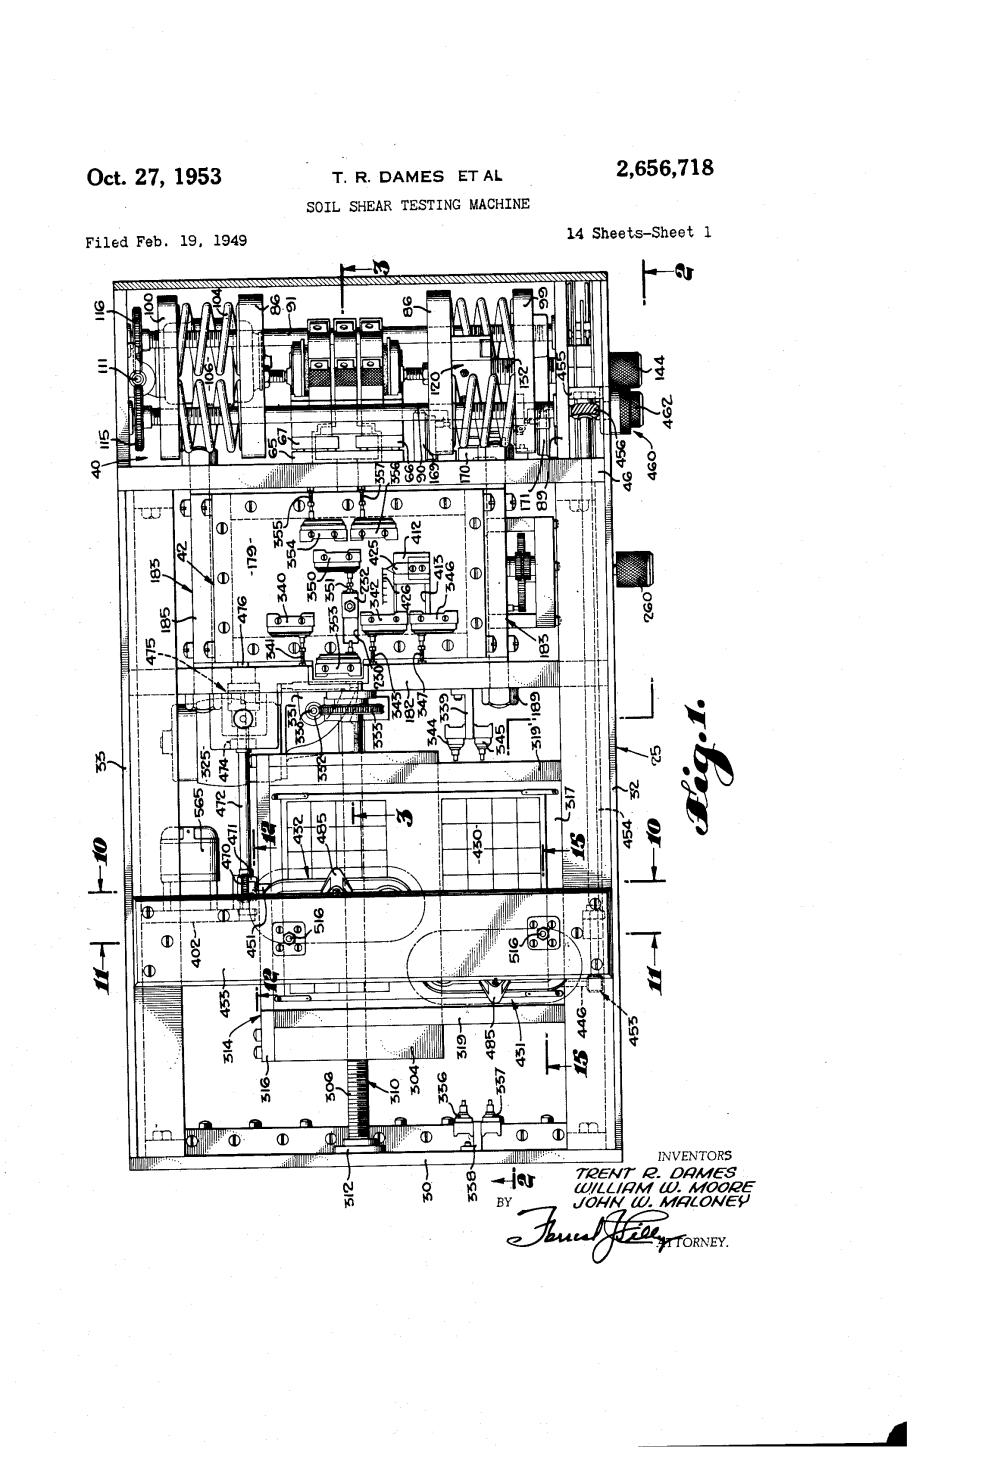 medium resolution of  us2656718 0 hub2b wiring diagram u2022 buccaneersvsrams co at cita asia